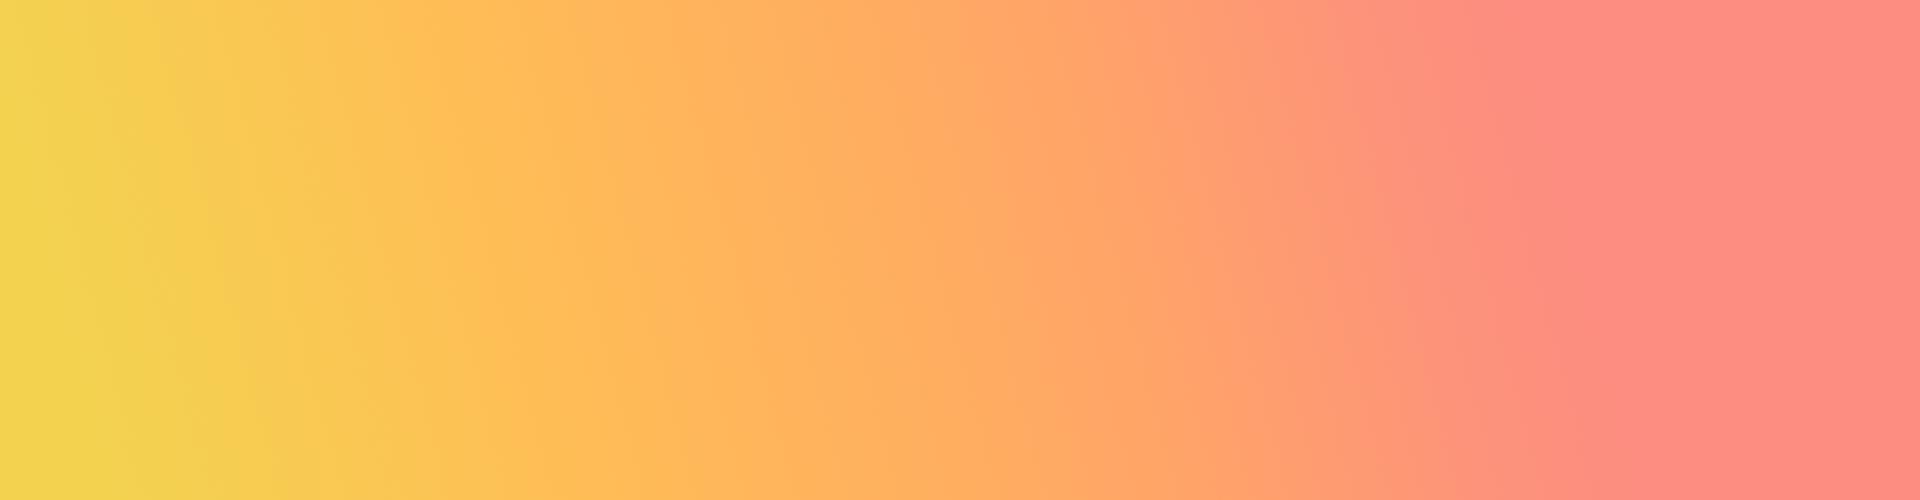 vida gradient yellow to pink